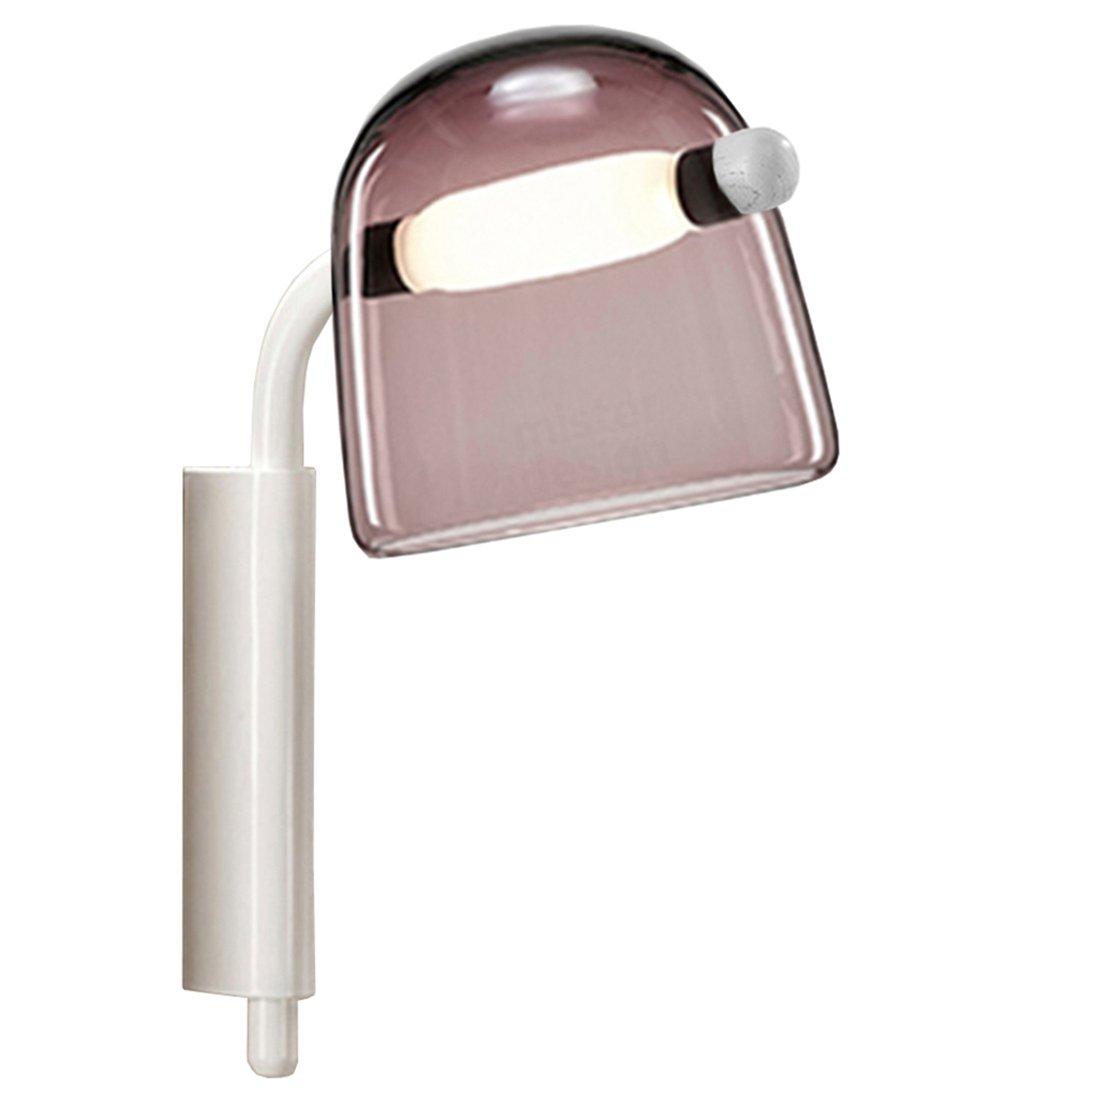 Brokis Mona Wandlamp Medium - Violet Glas Witte body